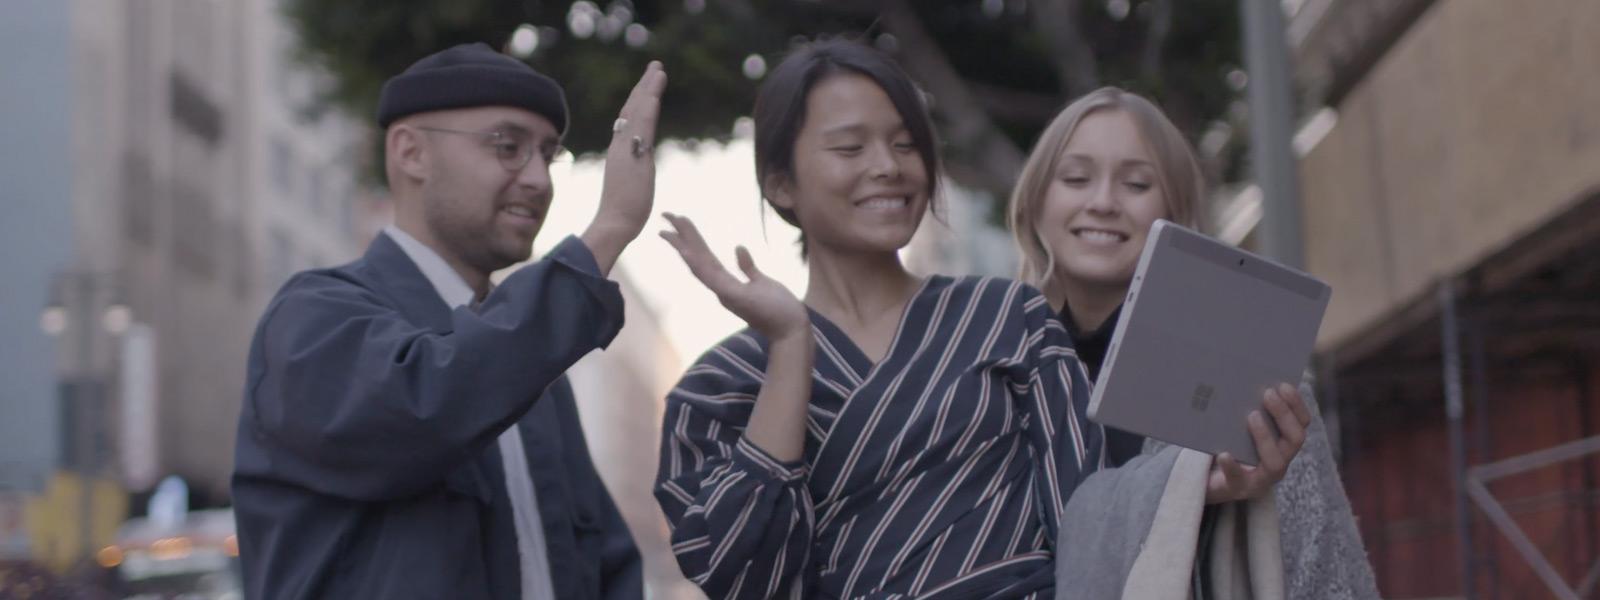 Surface Go로 화상 채팅하는 세 명의 사람